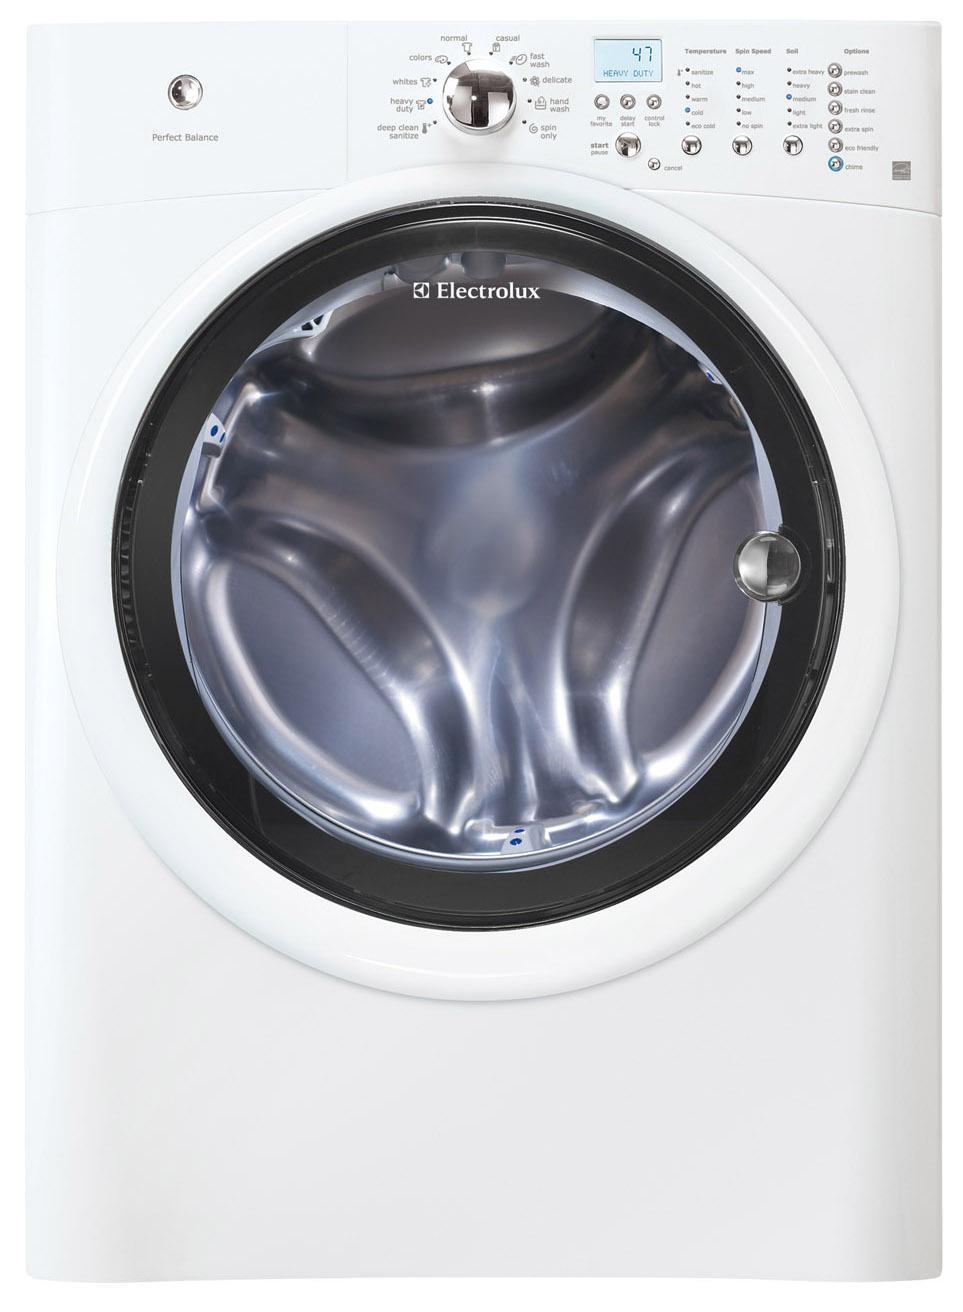 Electrolux Washers 4.2 Cu. Ft. Front Load Washer - Item Number: EIFLW50LIW